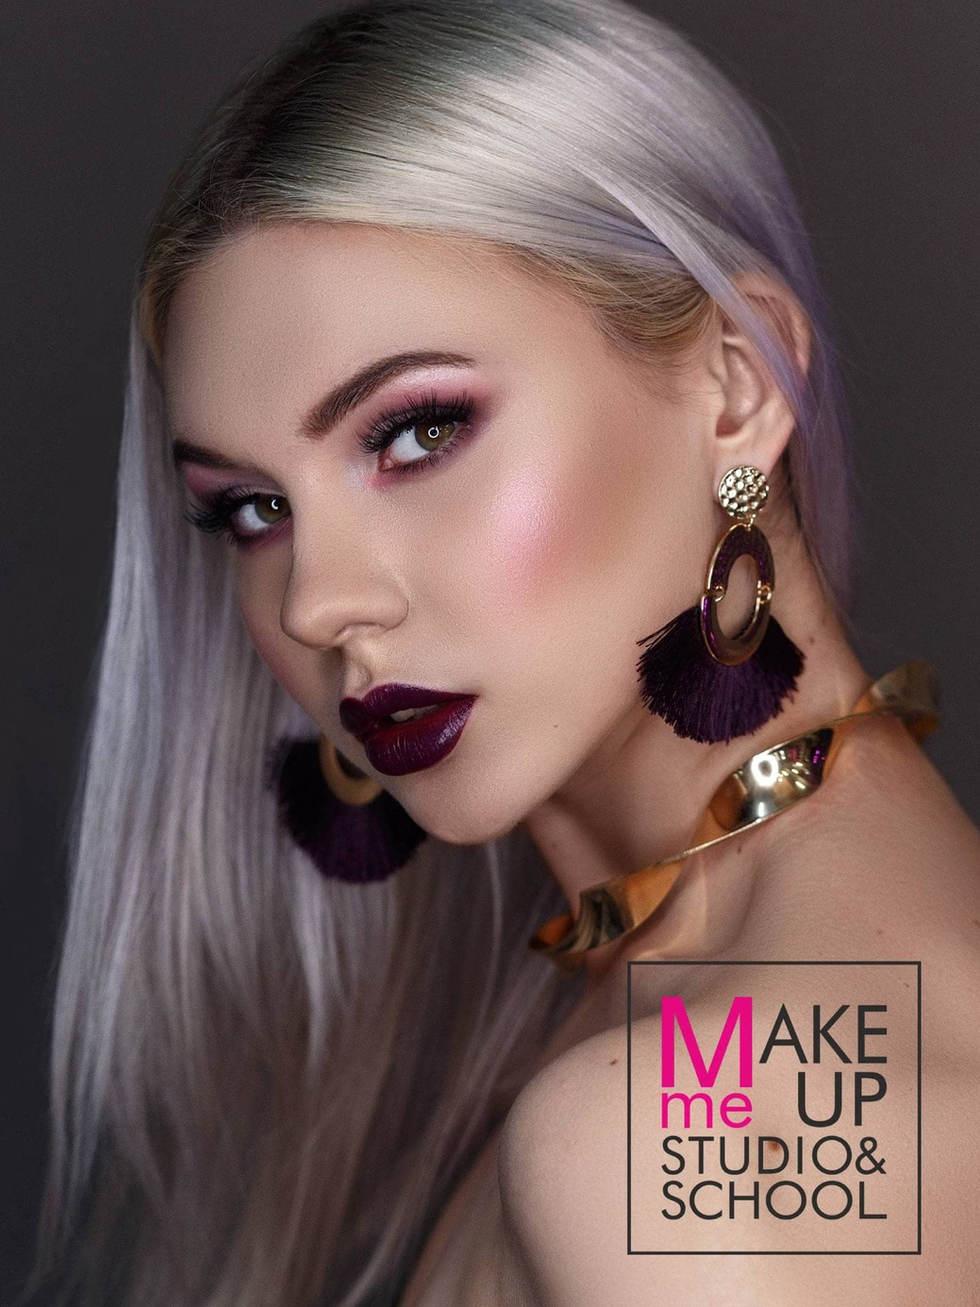 makeup-shool-odessa.jpg